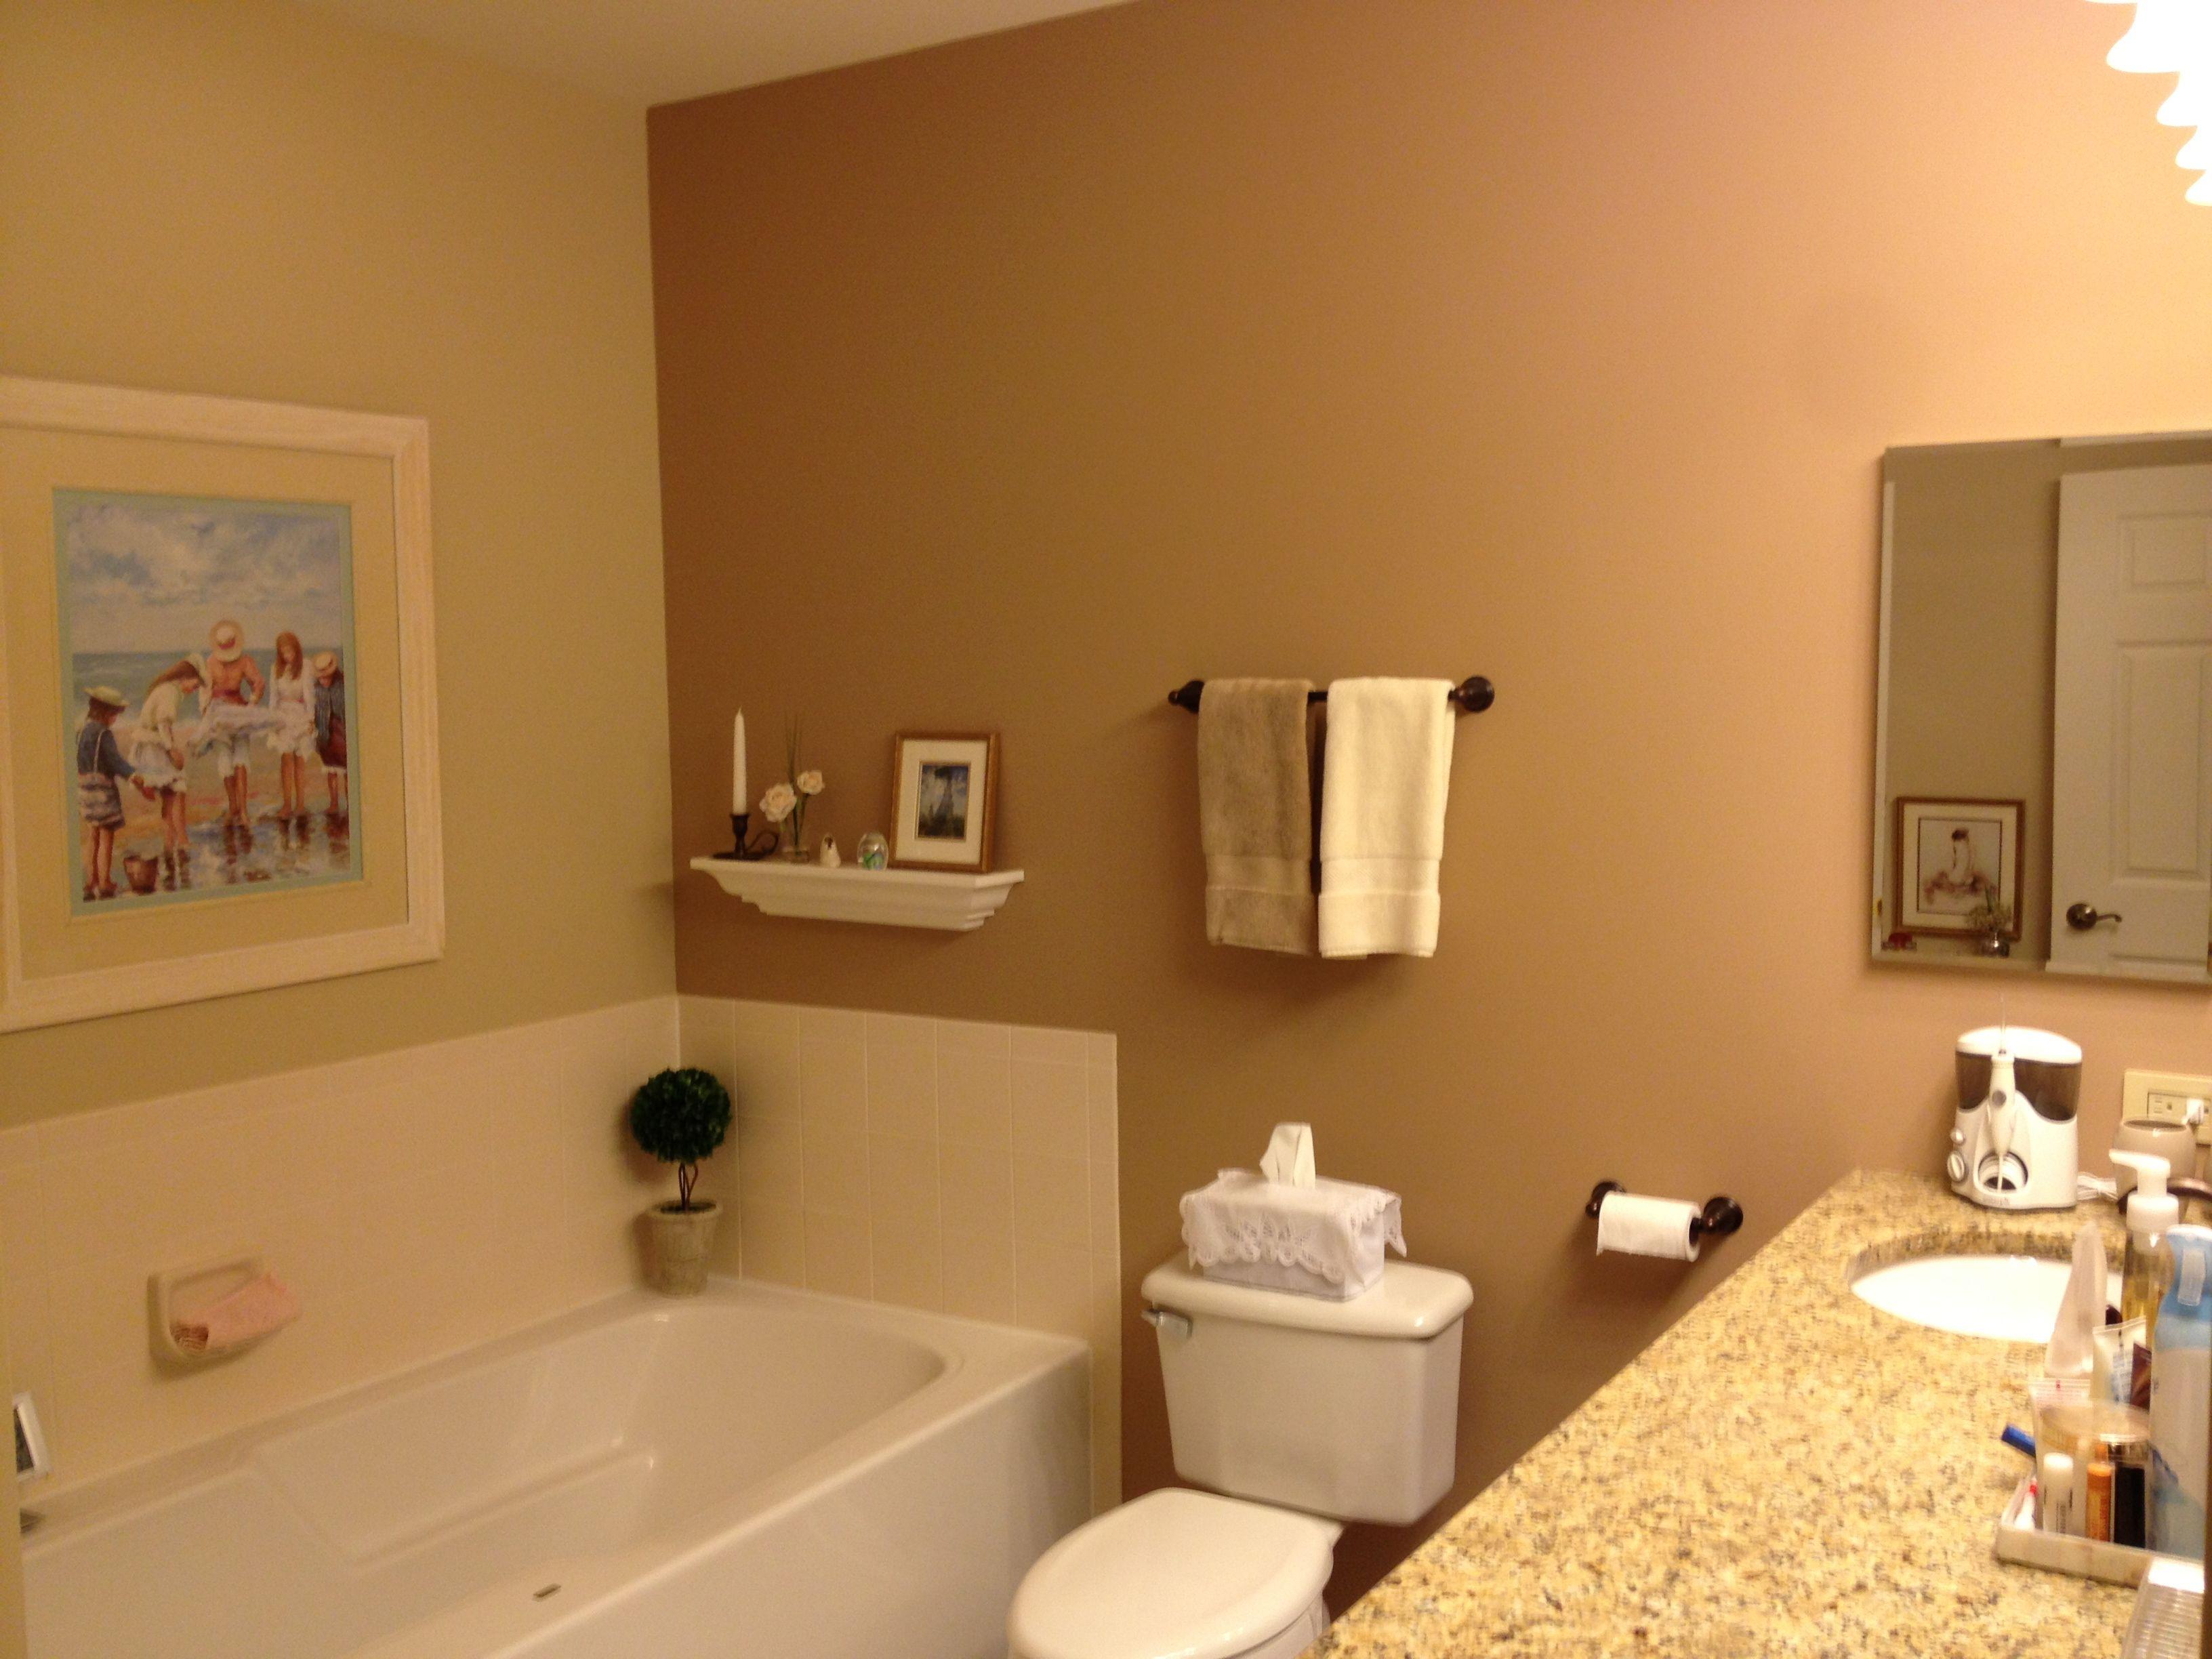 Bathroom Accent Wall Ideas #AccentWallIdeas Tags: accent ...